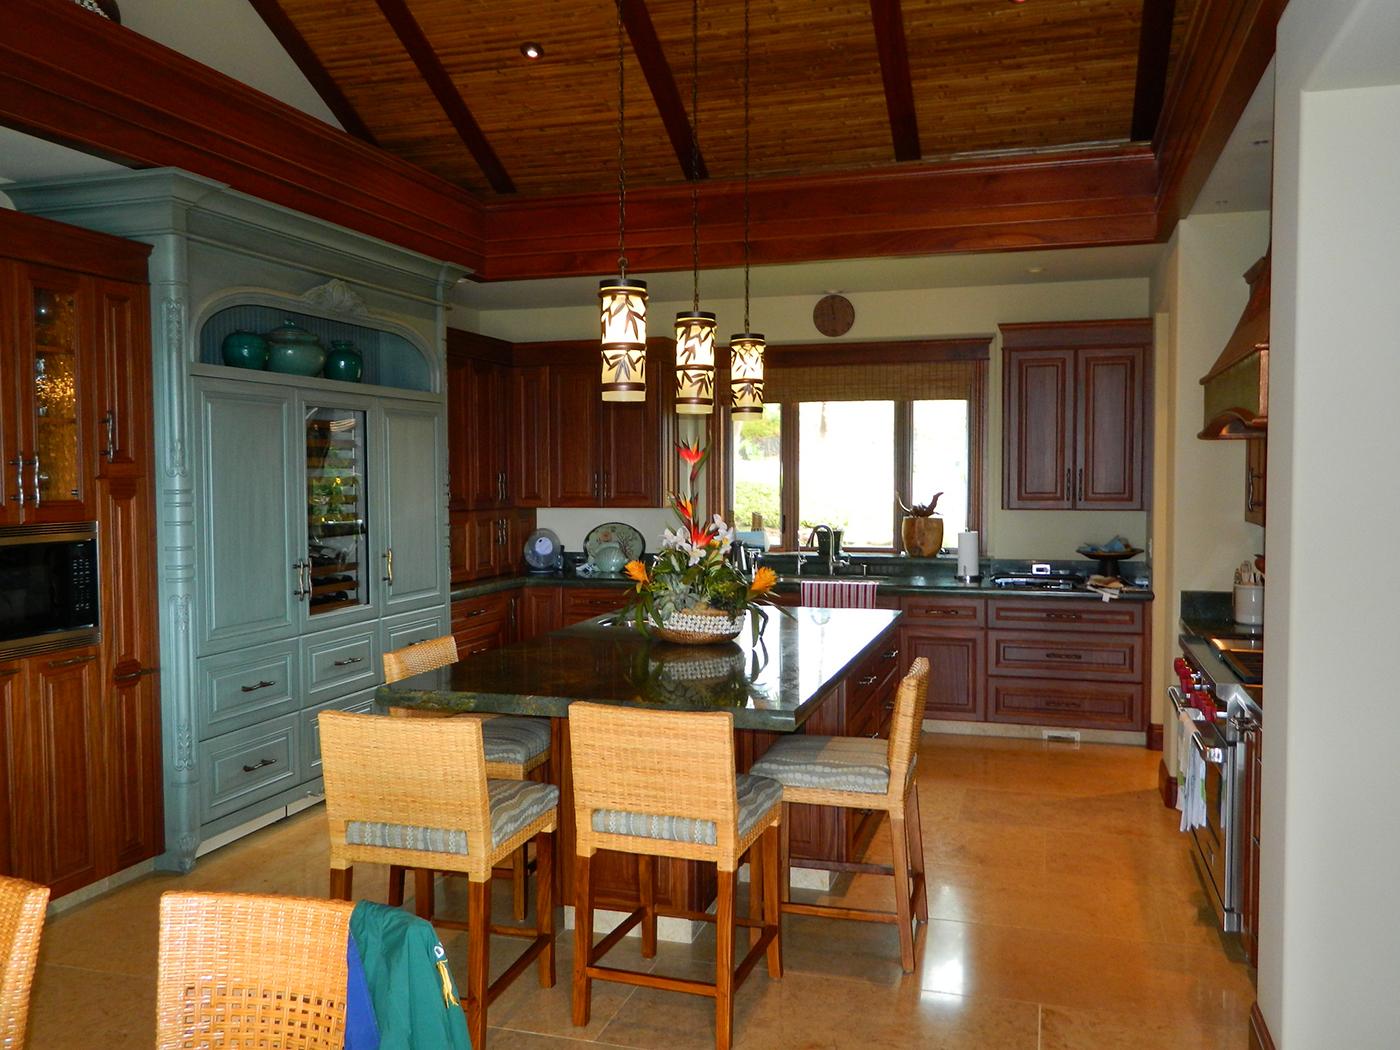 13 MAUI Residence - Kitchen with custom wood carved refridgerator cladding.JPG